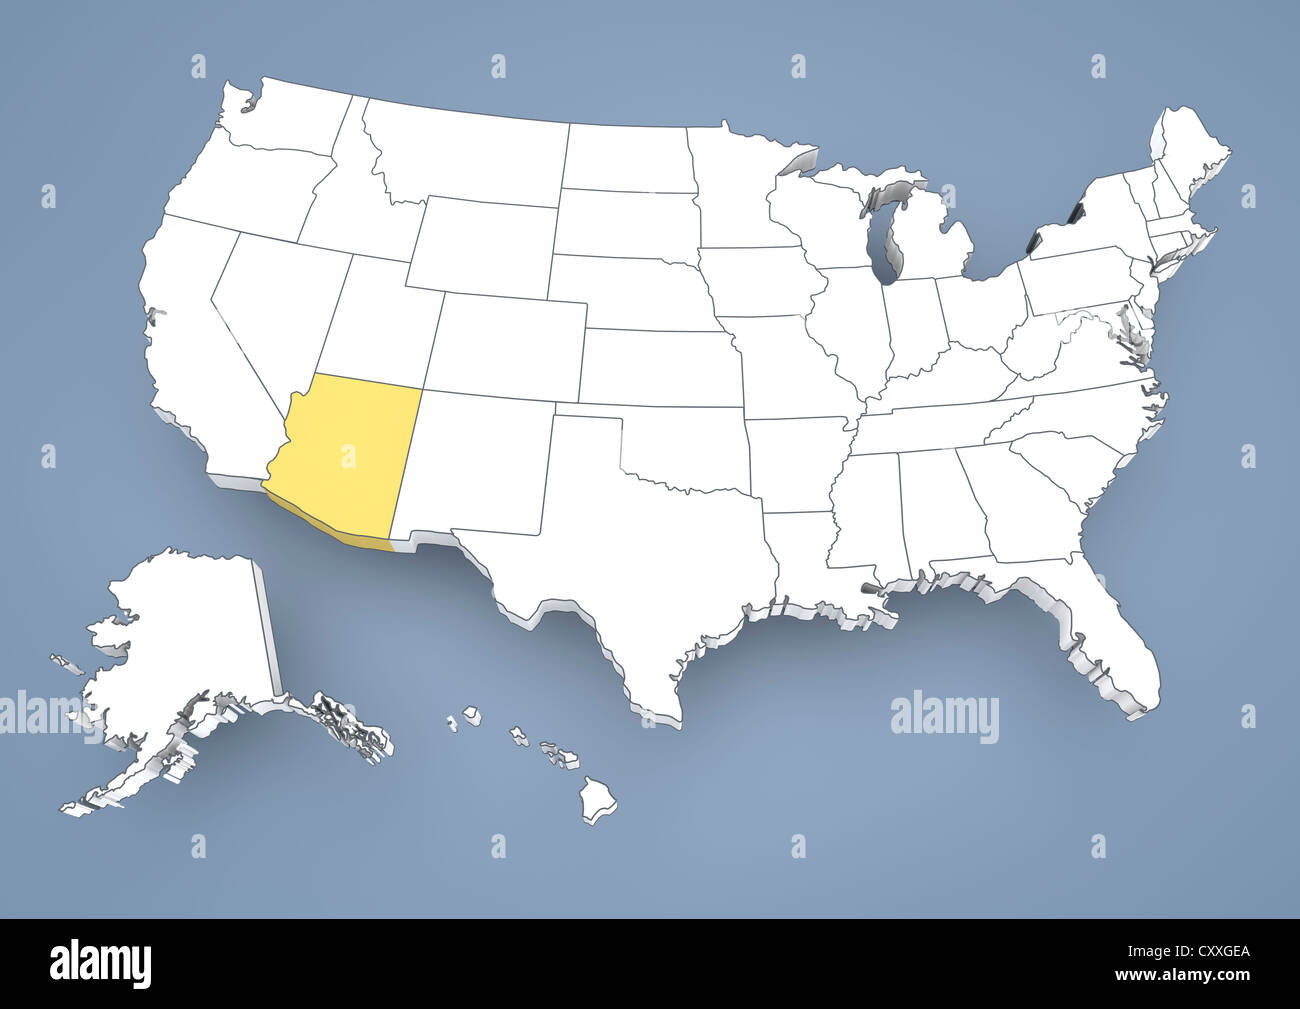 Arizona AZ Highlighted On A Contour Map Of USA United States Of - Arizona on the us map